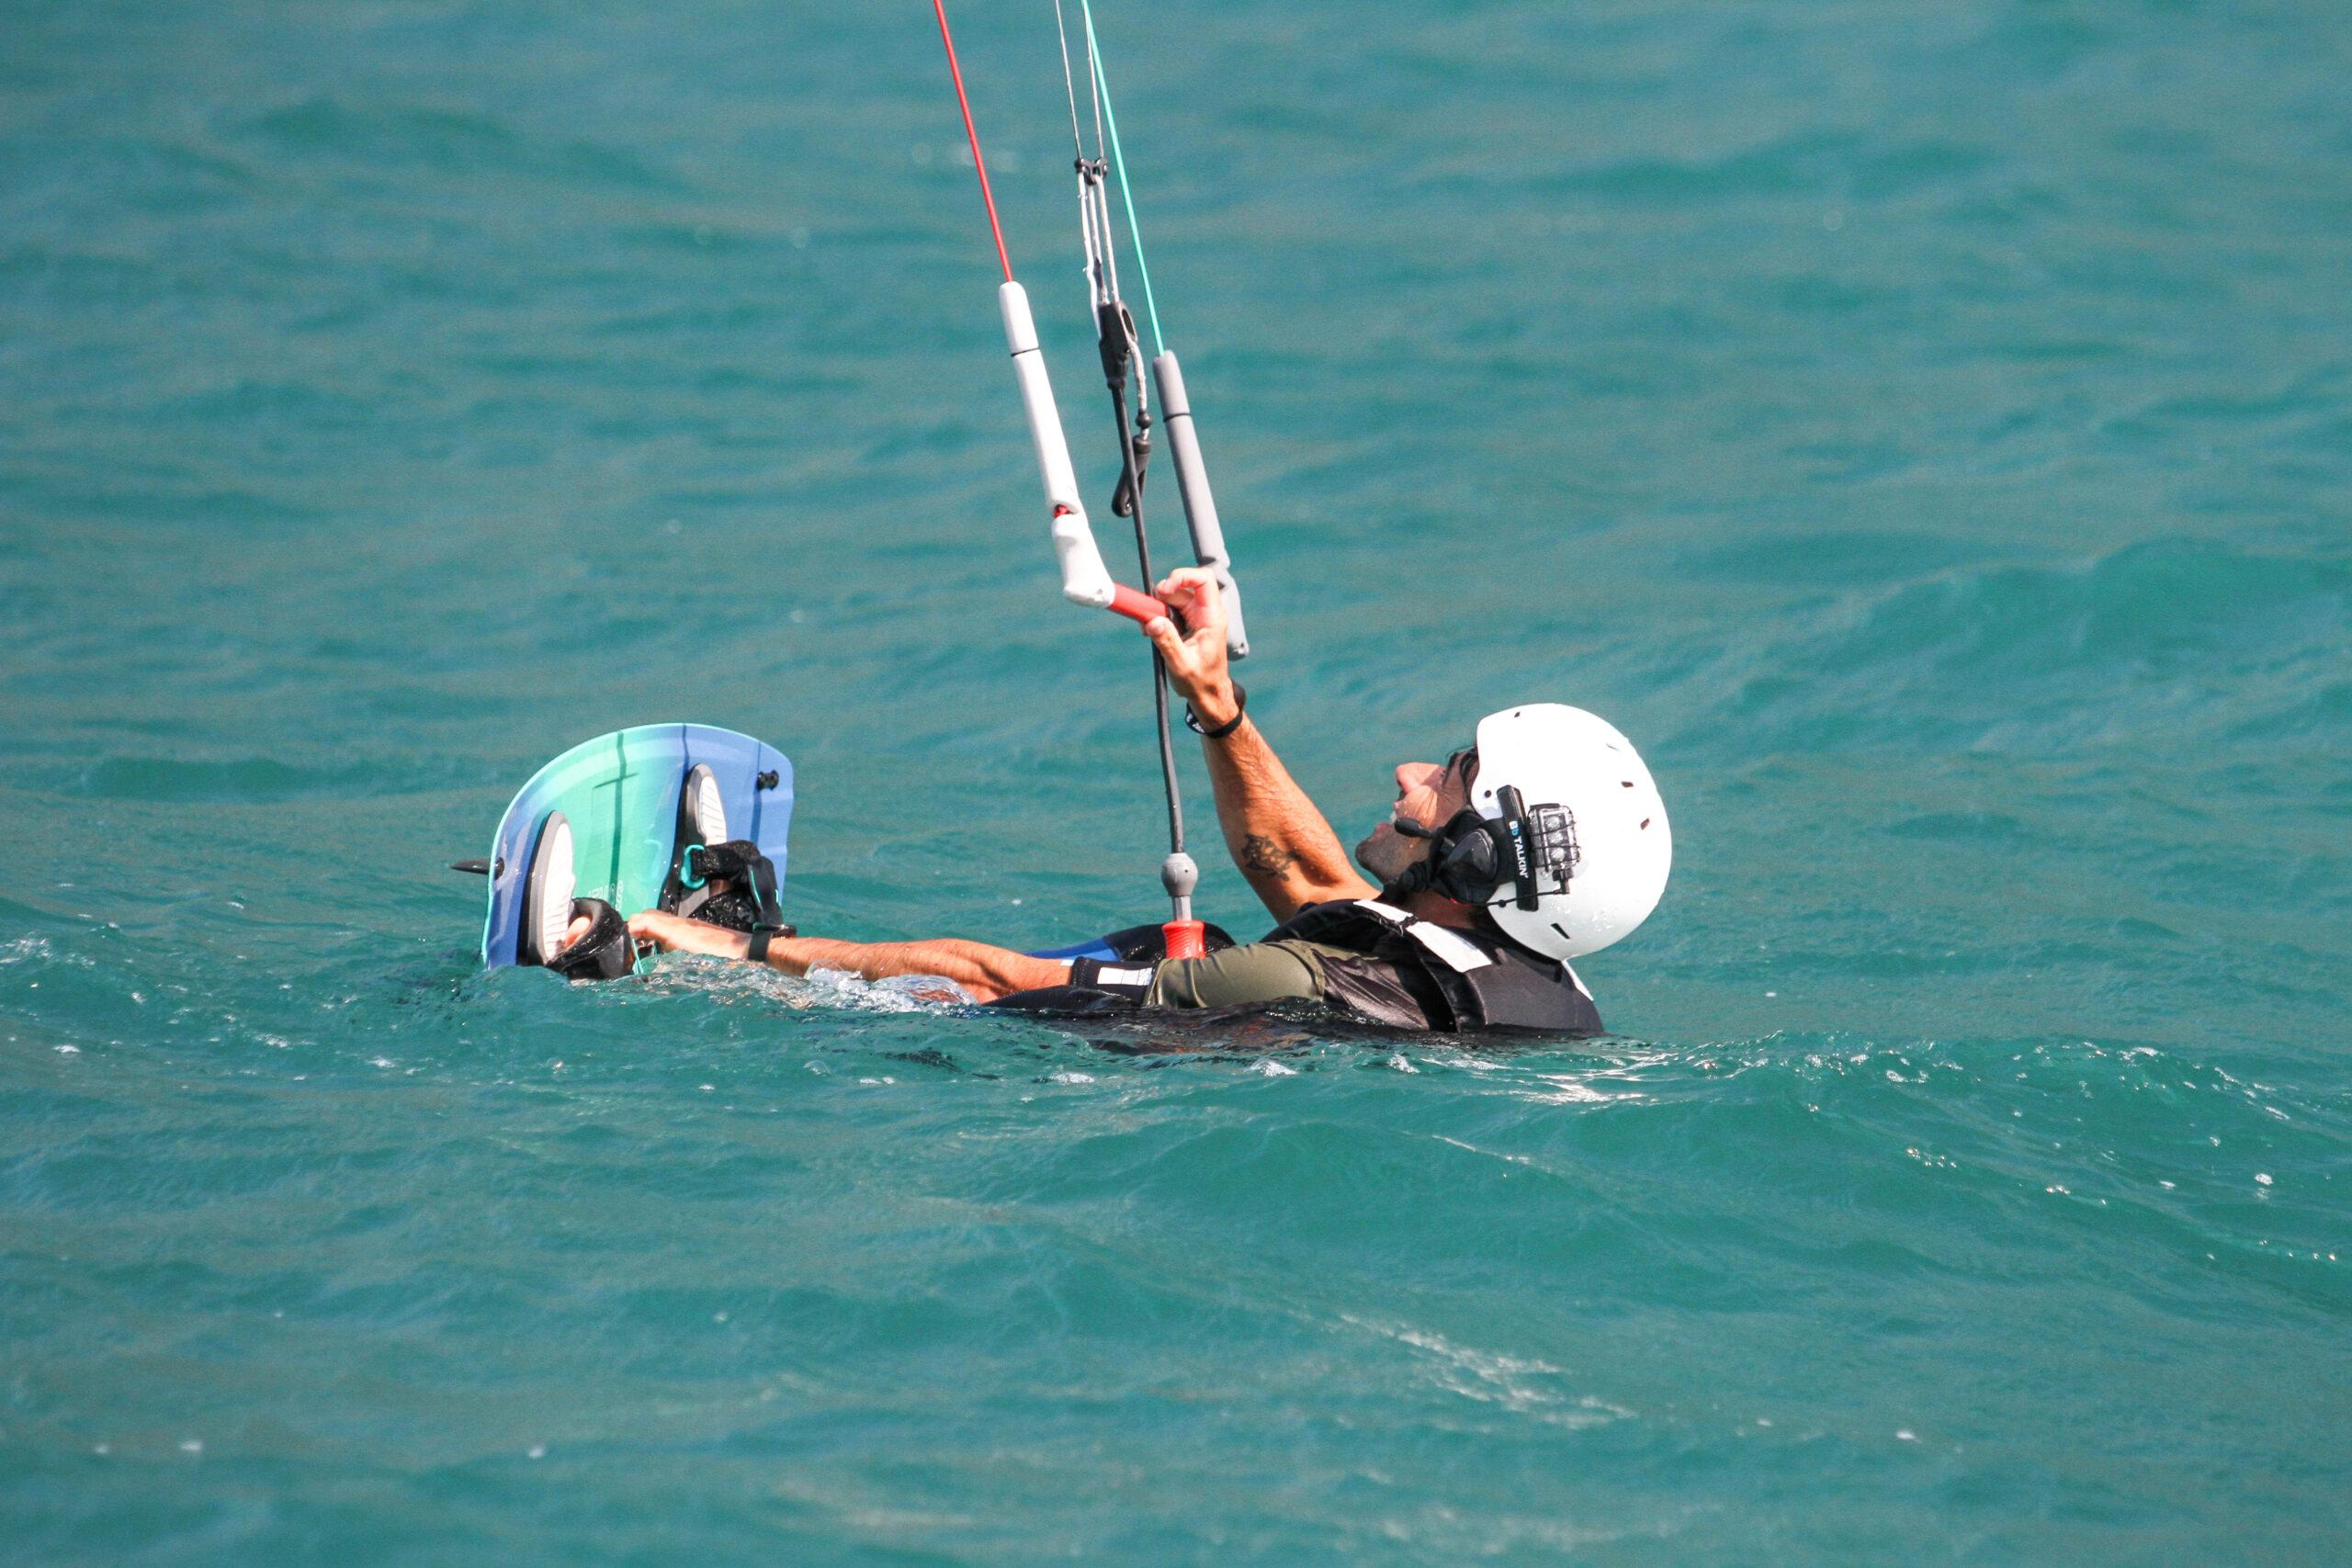 Corso base kitesurf